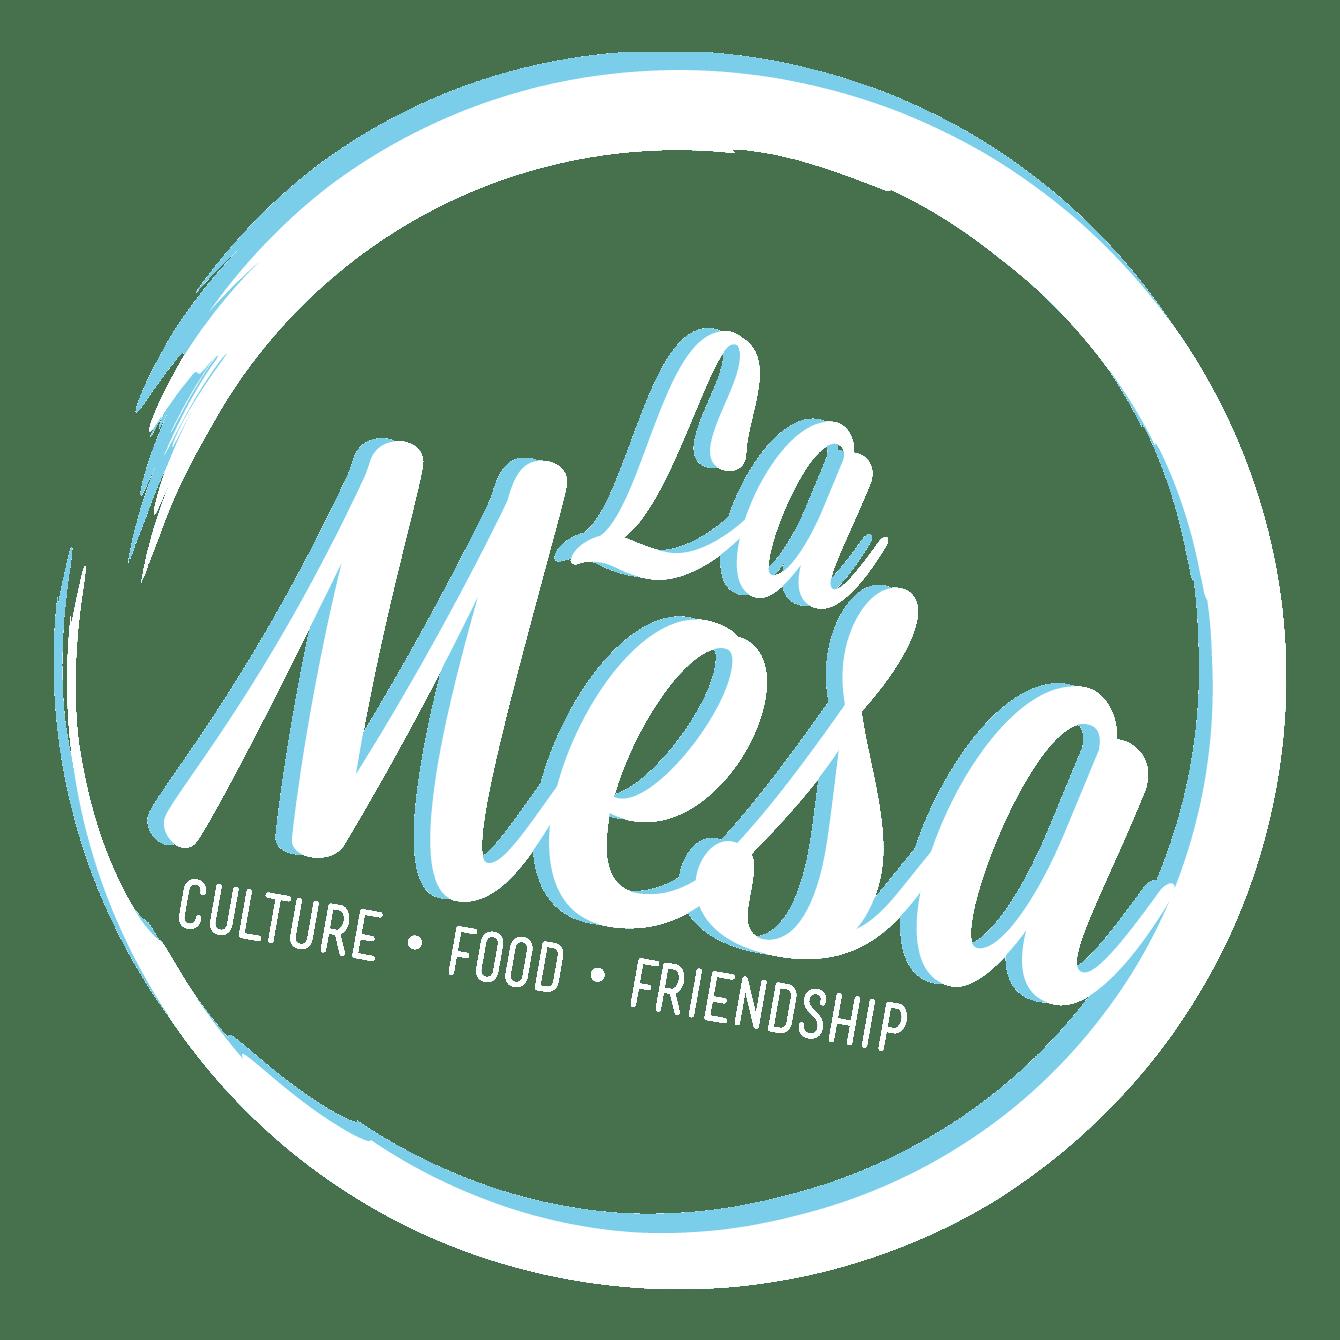 La Mesa logo design and branding by DIF Design